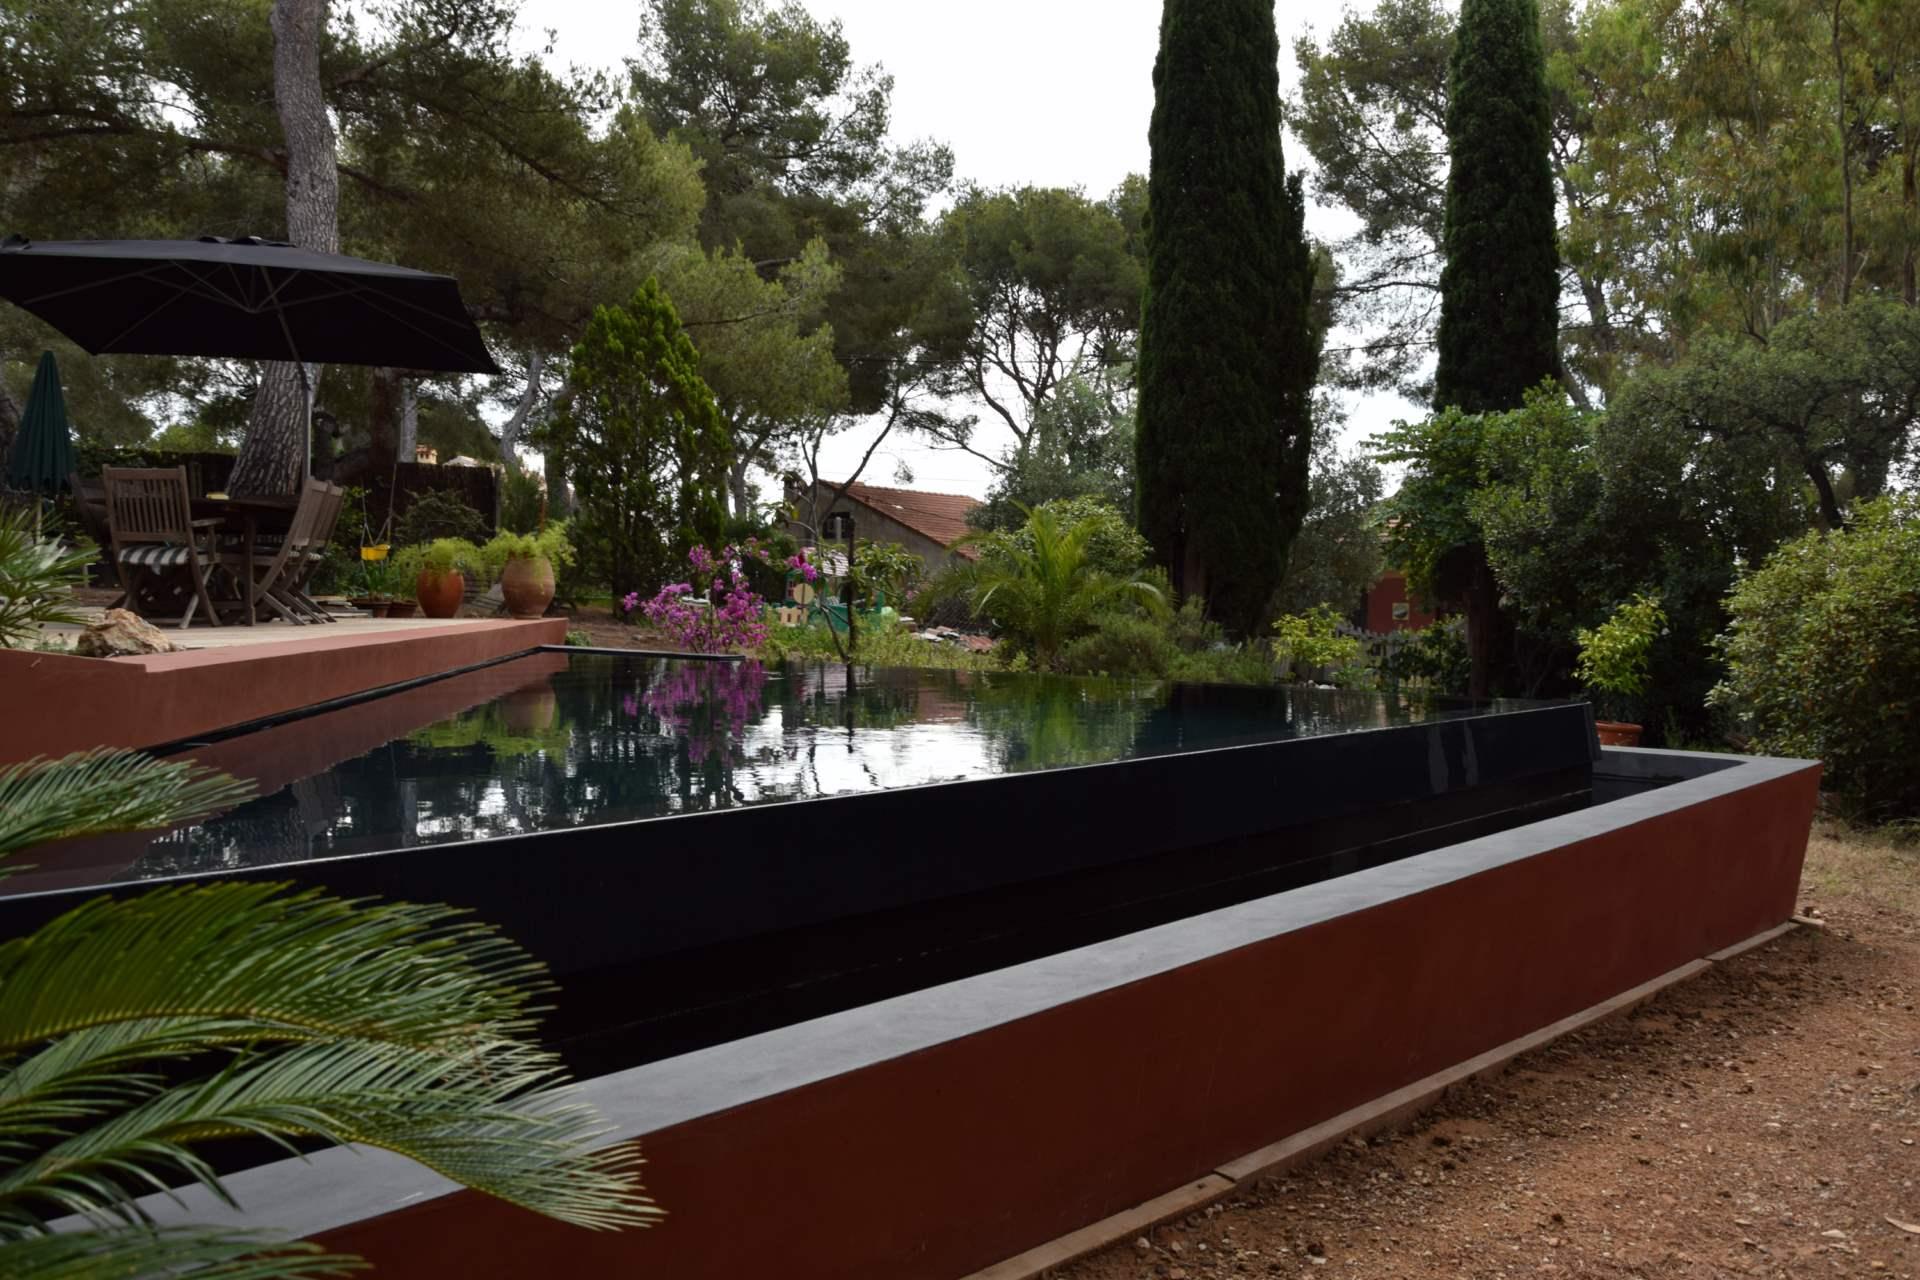 D co piscine debordement cotes besancon 13 piscine for Adresse piscine molitor